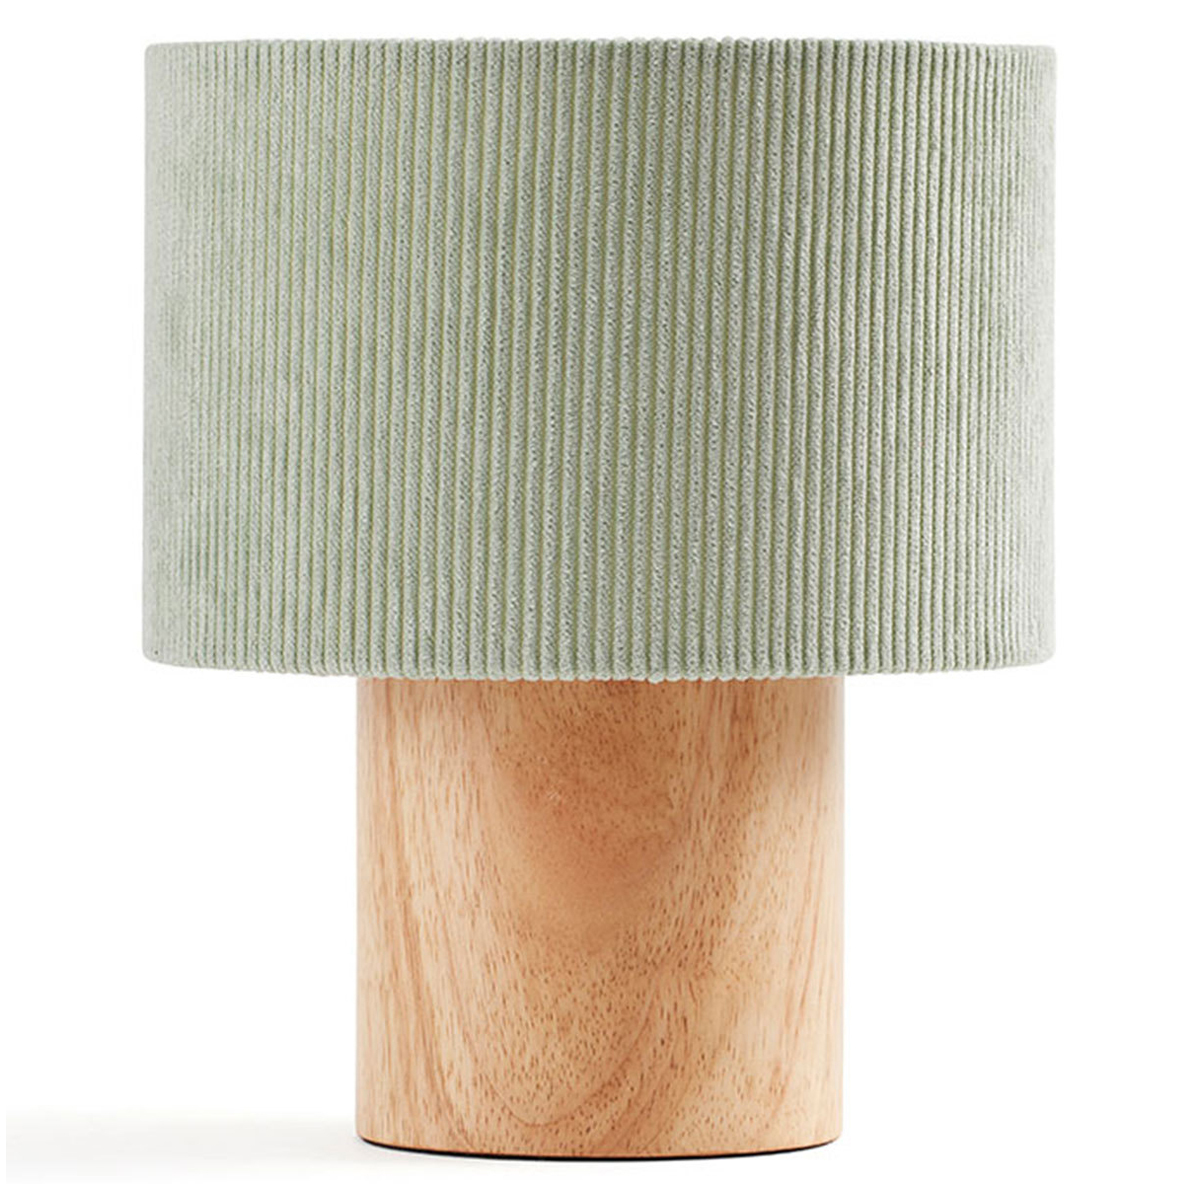 Lampe à poser Lampe à Poser Velours - Vert